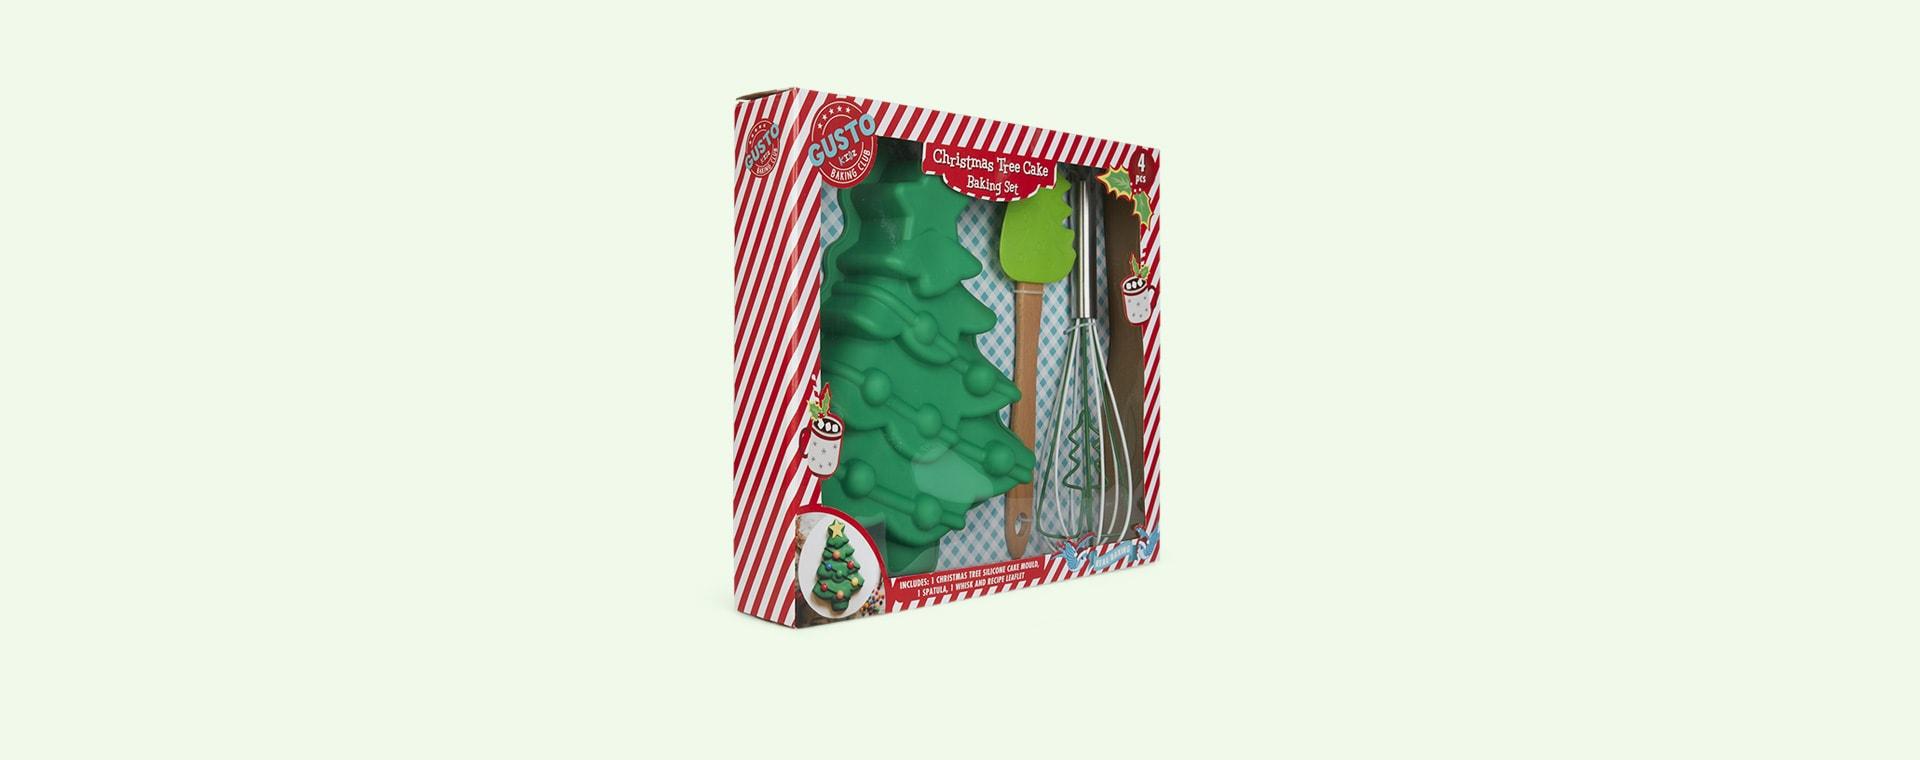 Multi Gusto Christmas Tree Baking Set